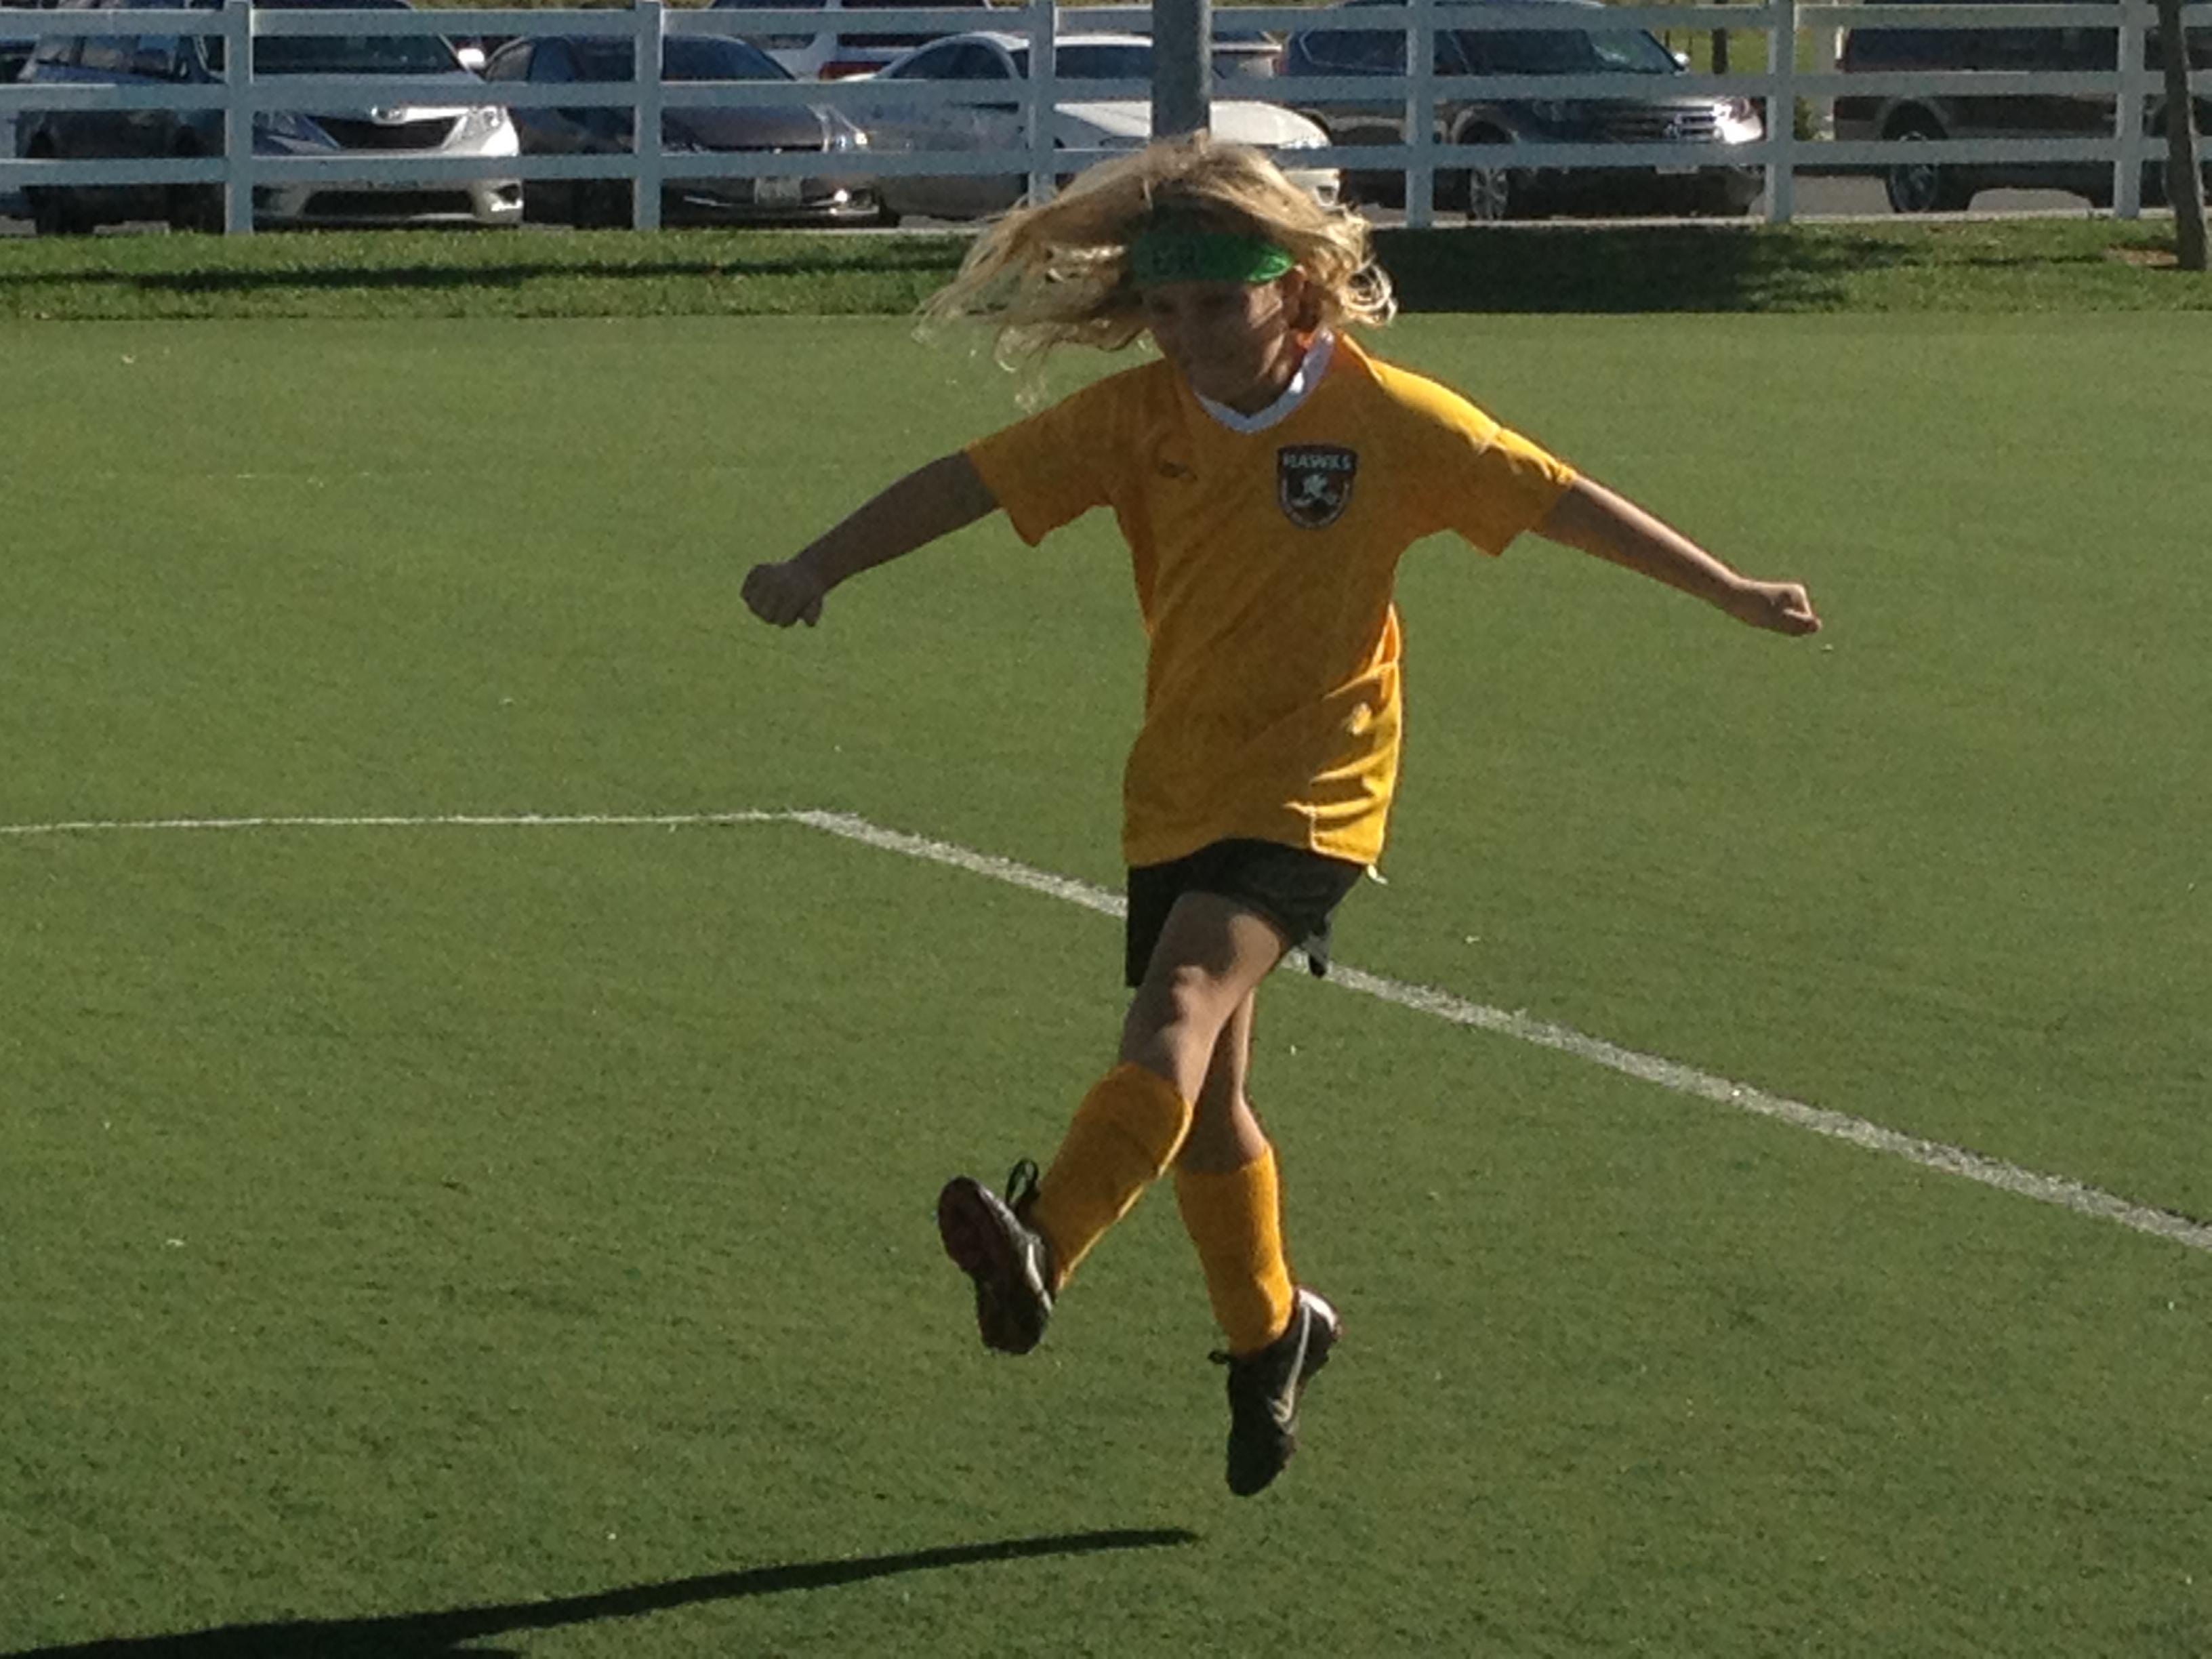 E my soccer stud